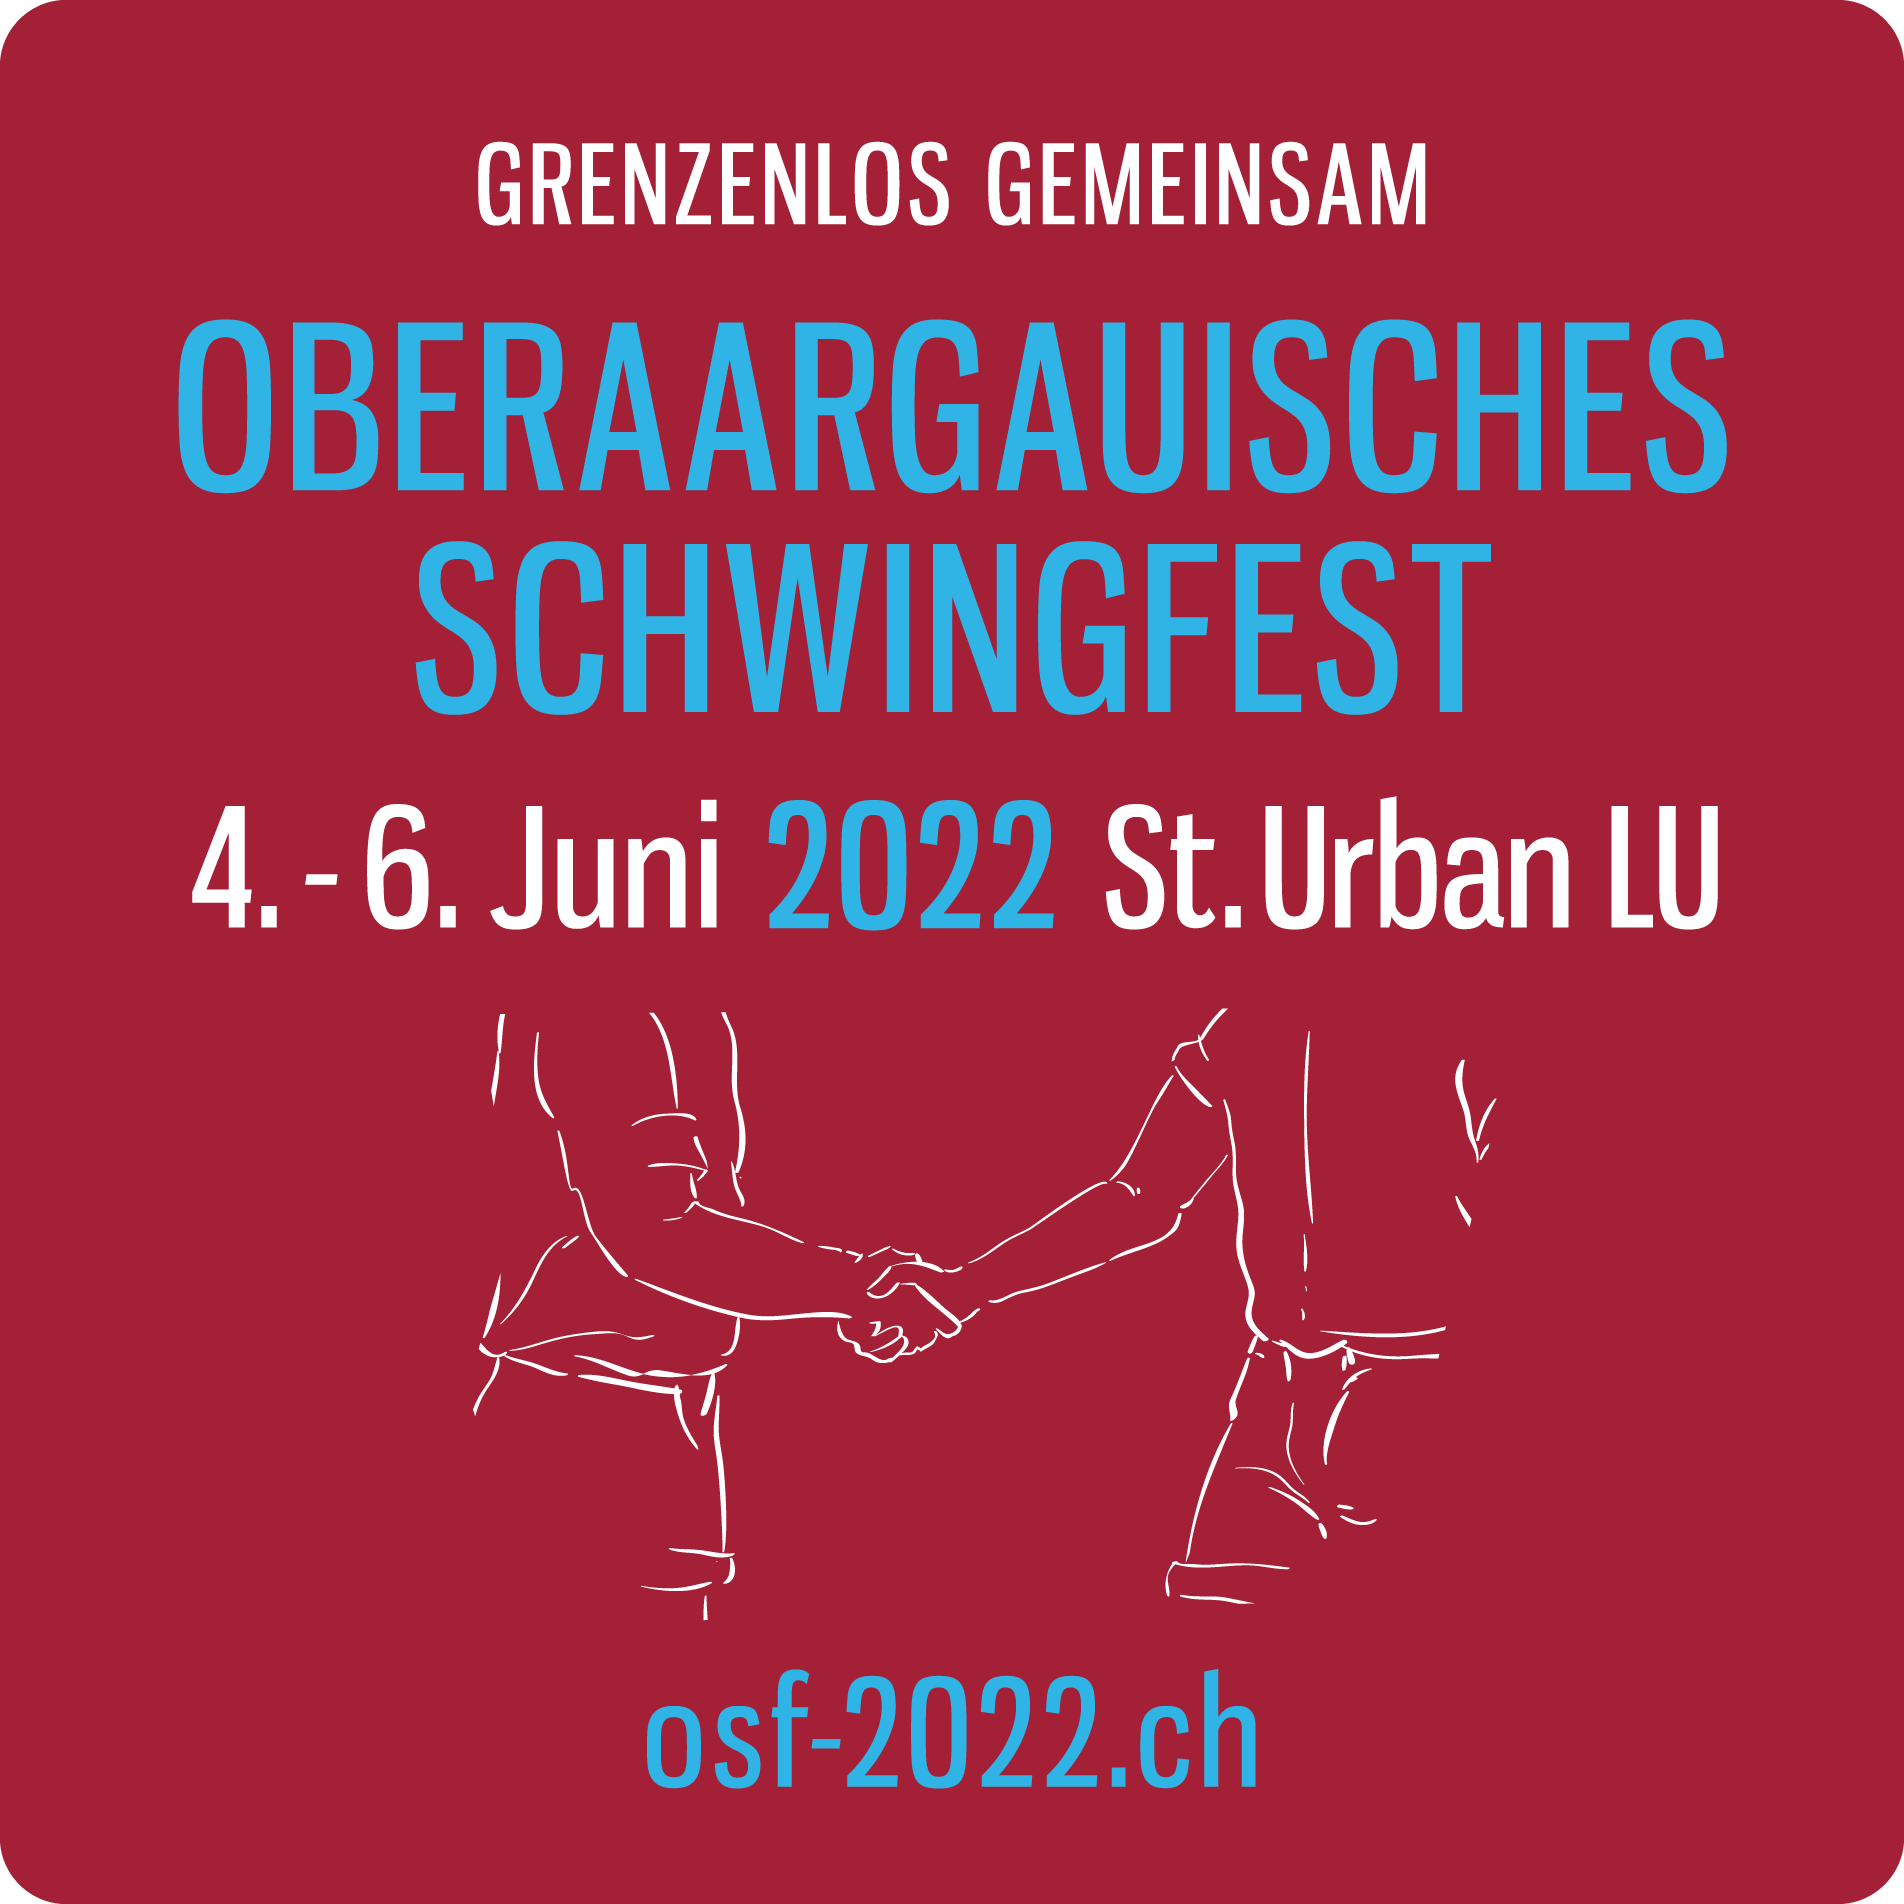 Oberaargauisches Schwingfest 2022